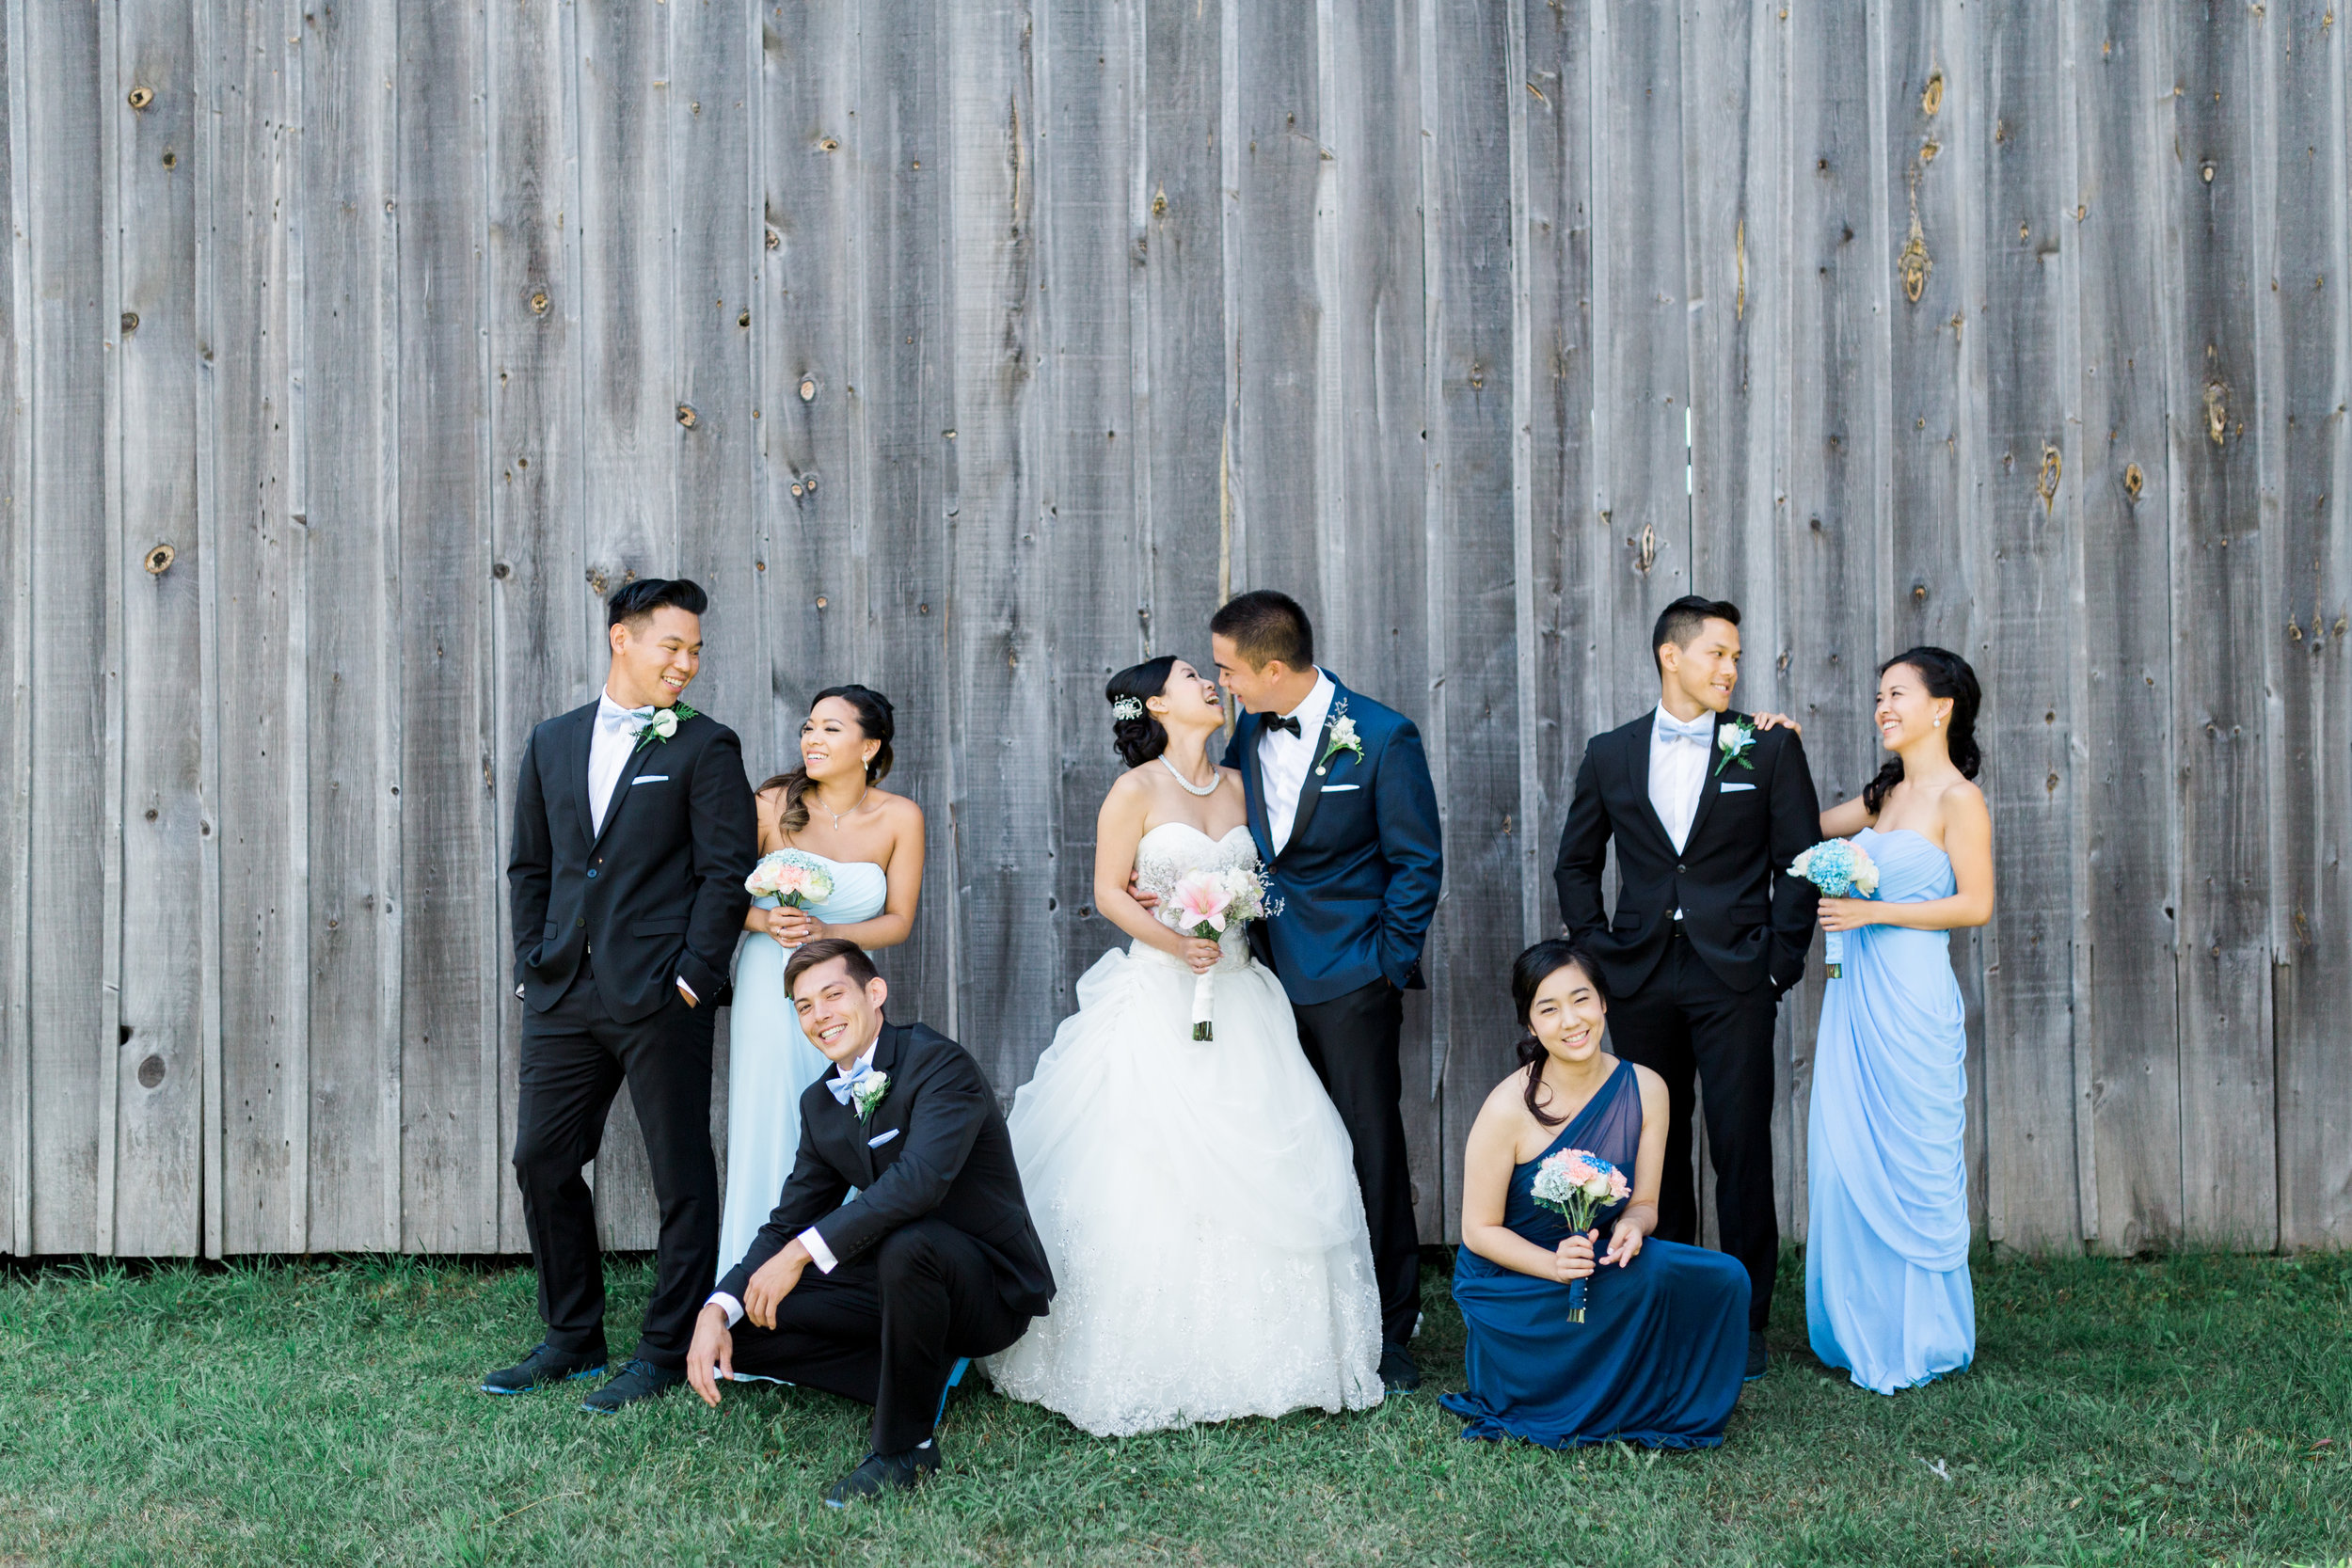 Toronto Fine Art Photographer - Markham Museum Wedding - Bridal Party Portraits-17.jpg